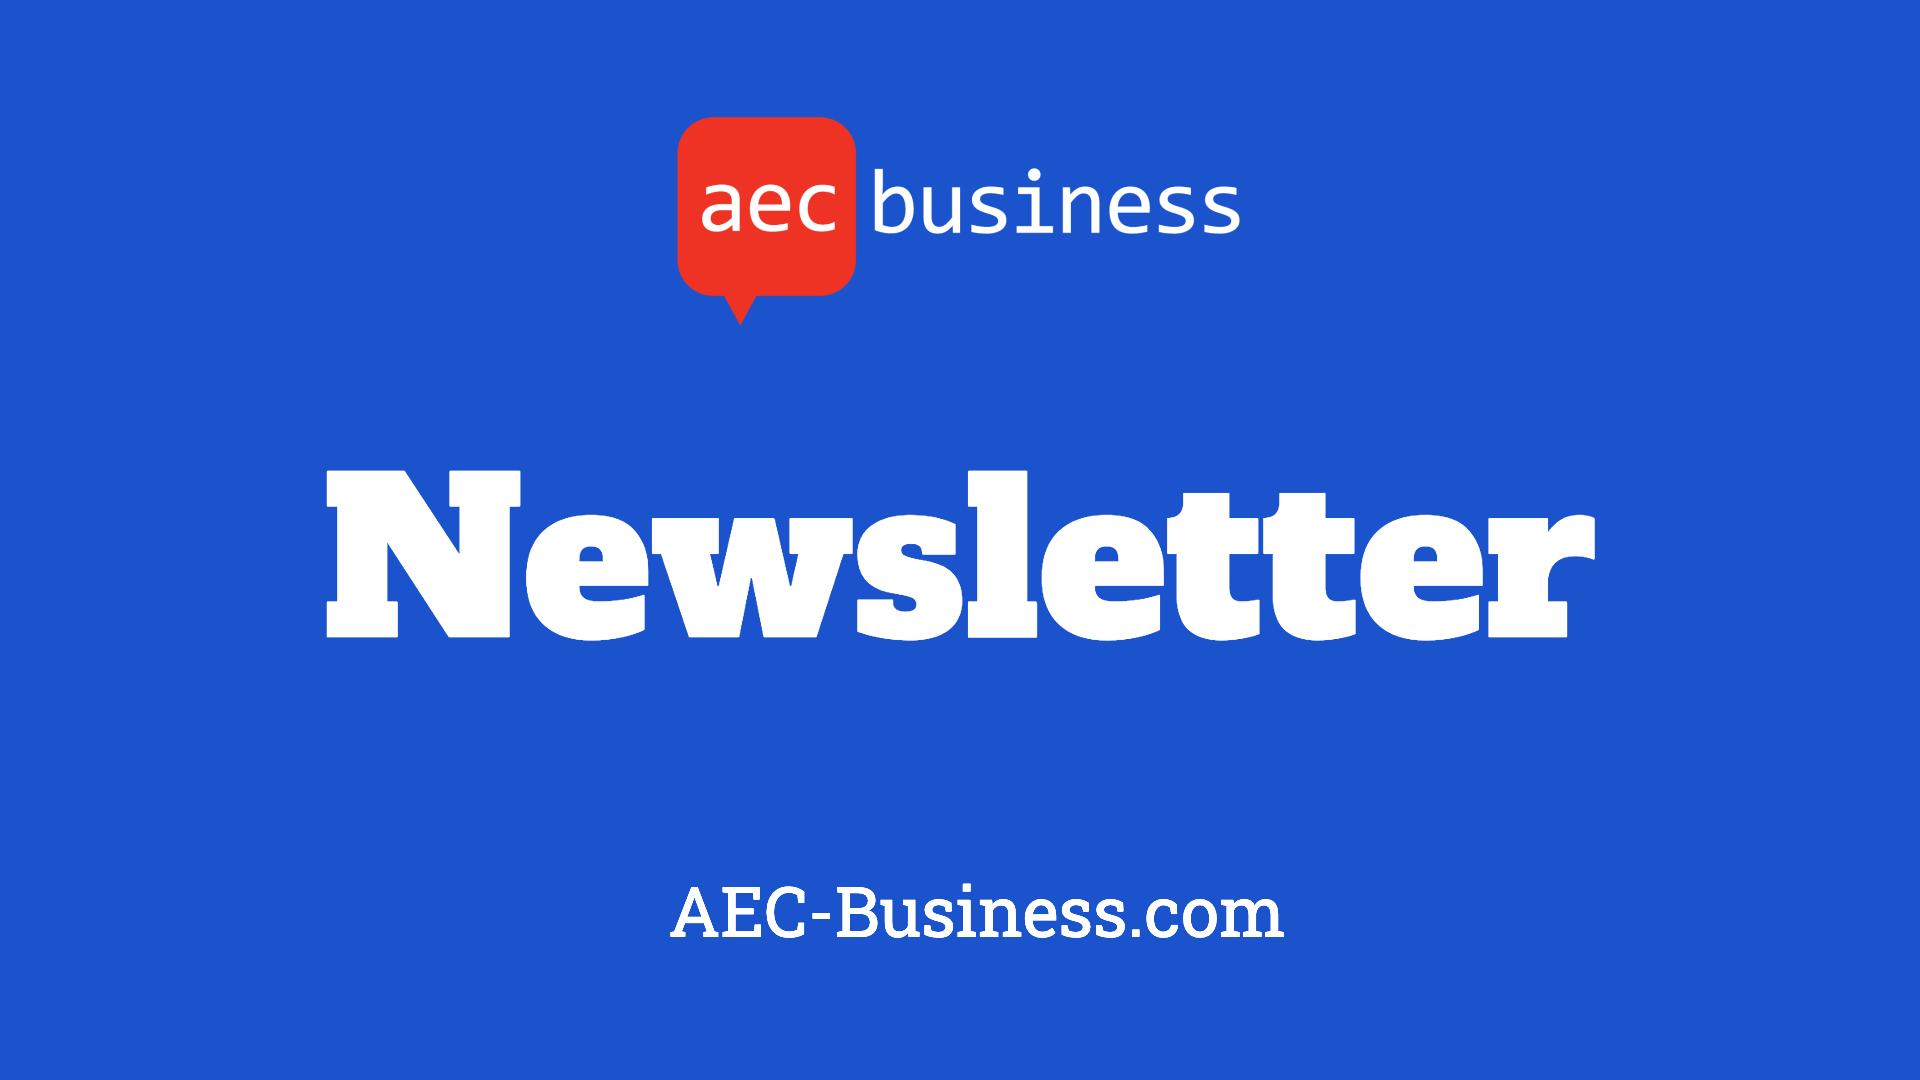 AEC Business Newsletter